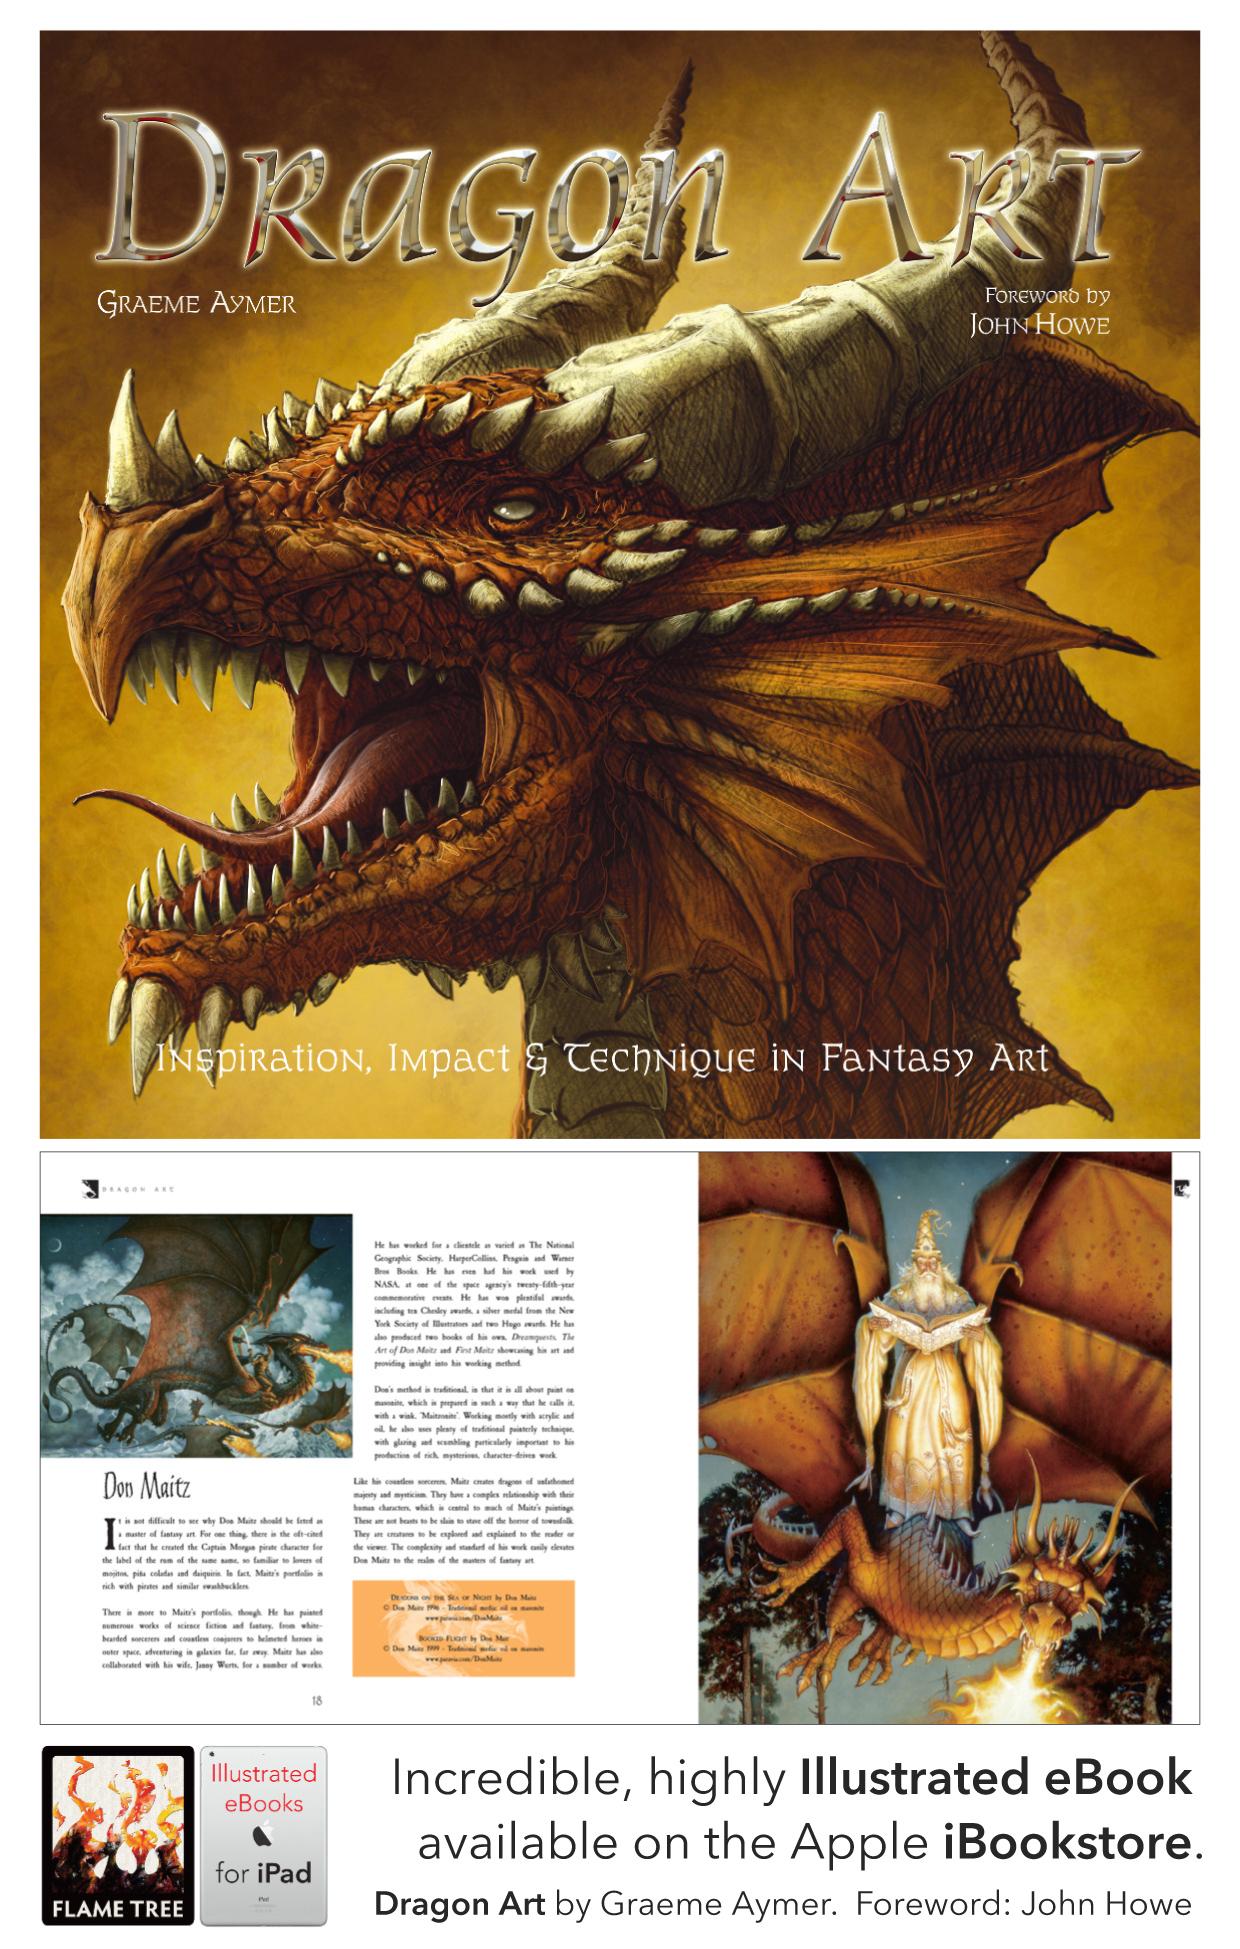 Dragon Art, Digital Art, iPad ready